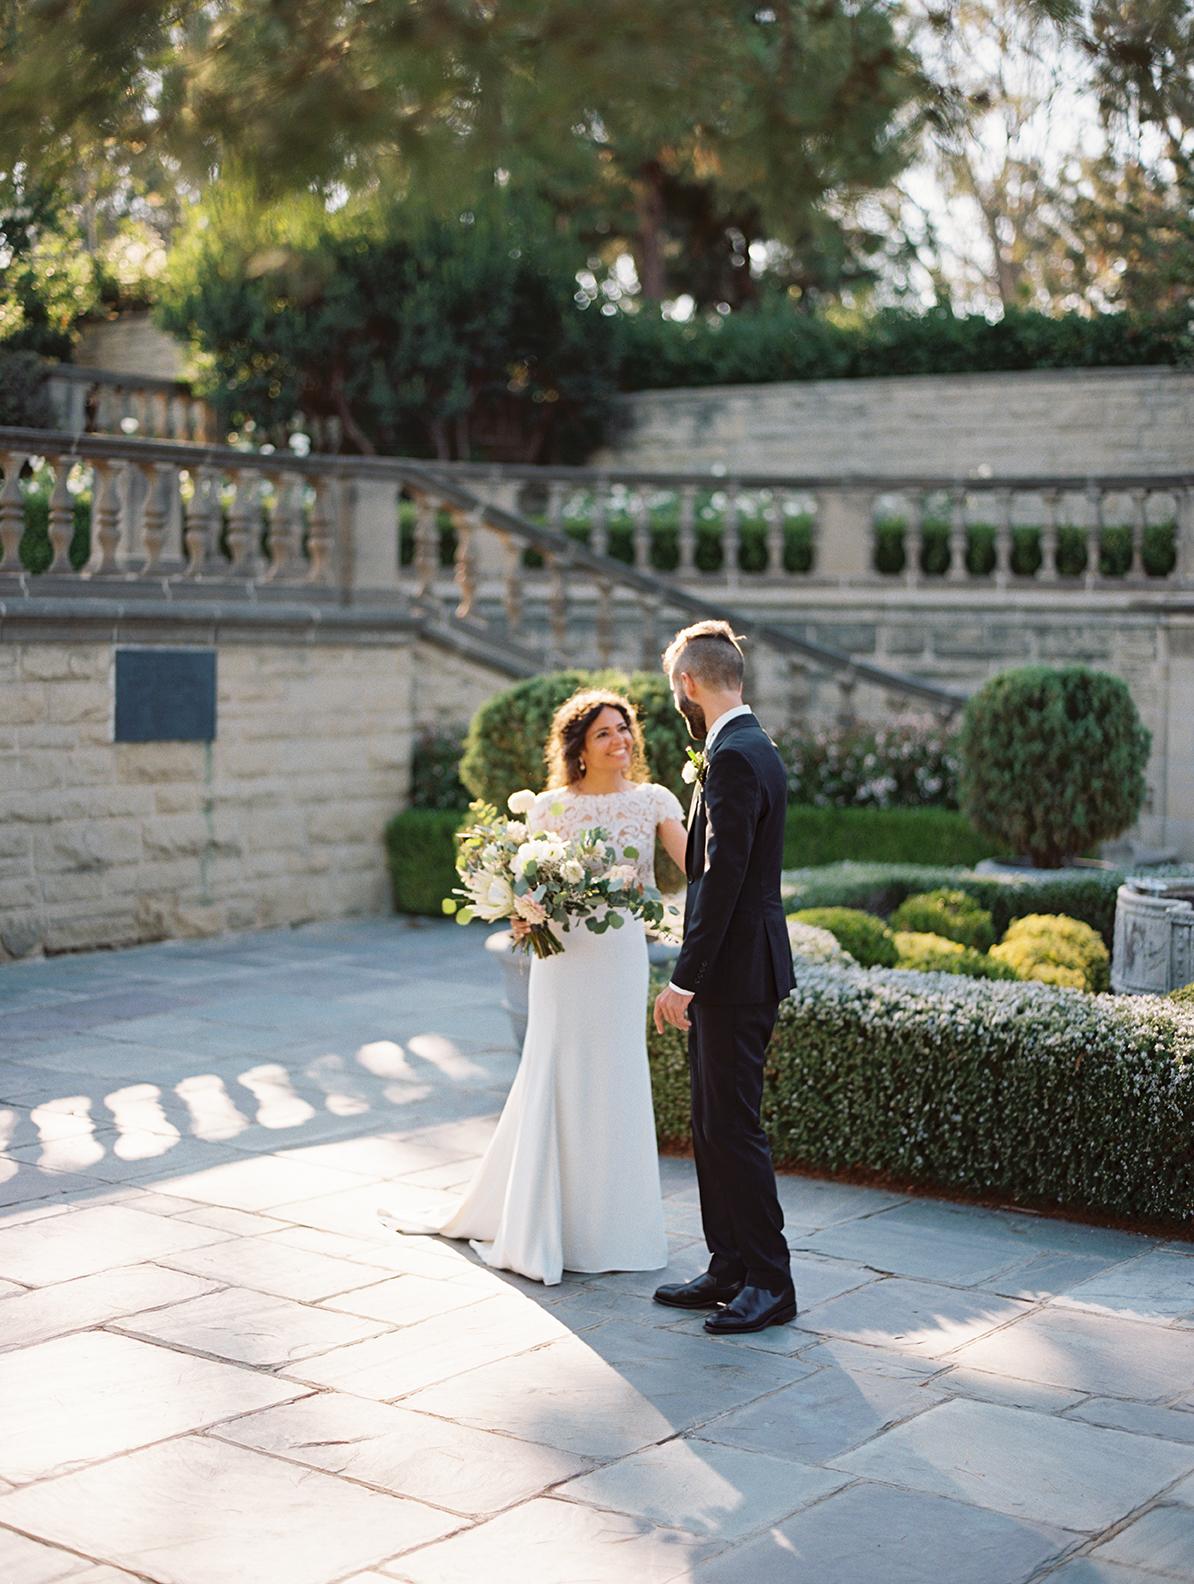 117-brian-sarra-los-angeles-wedding-brumley-wells-photography.jpg